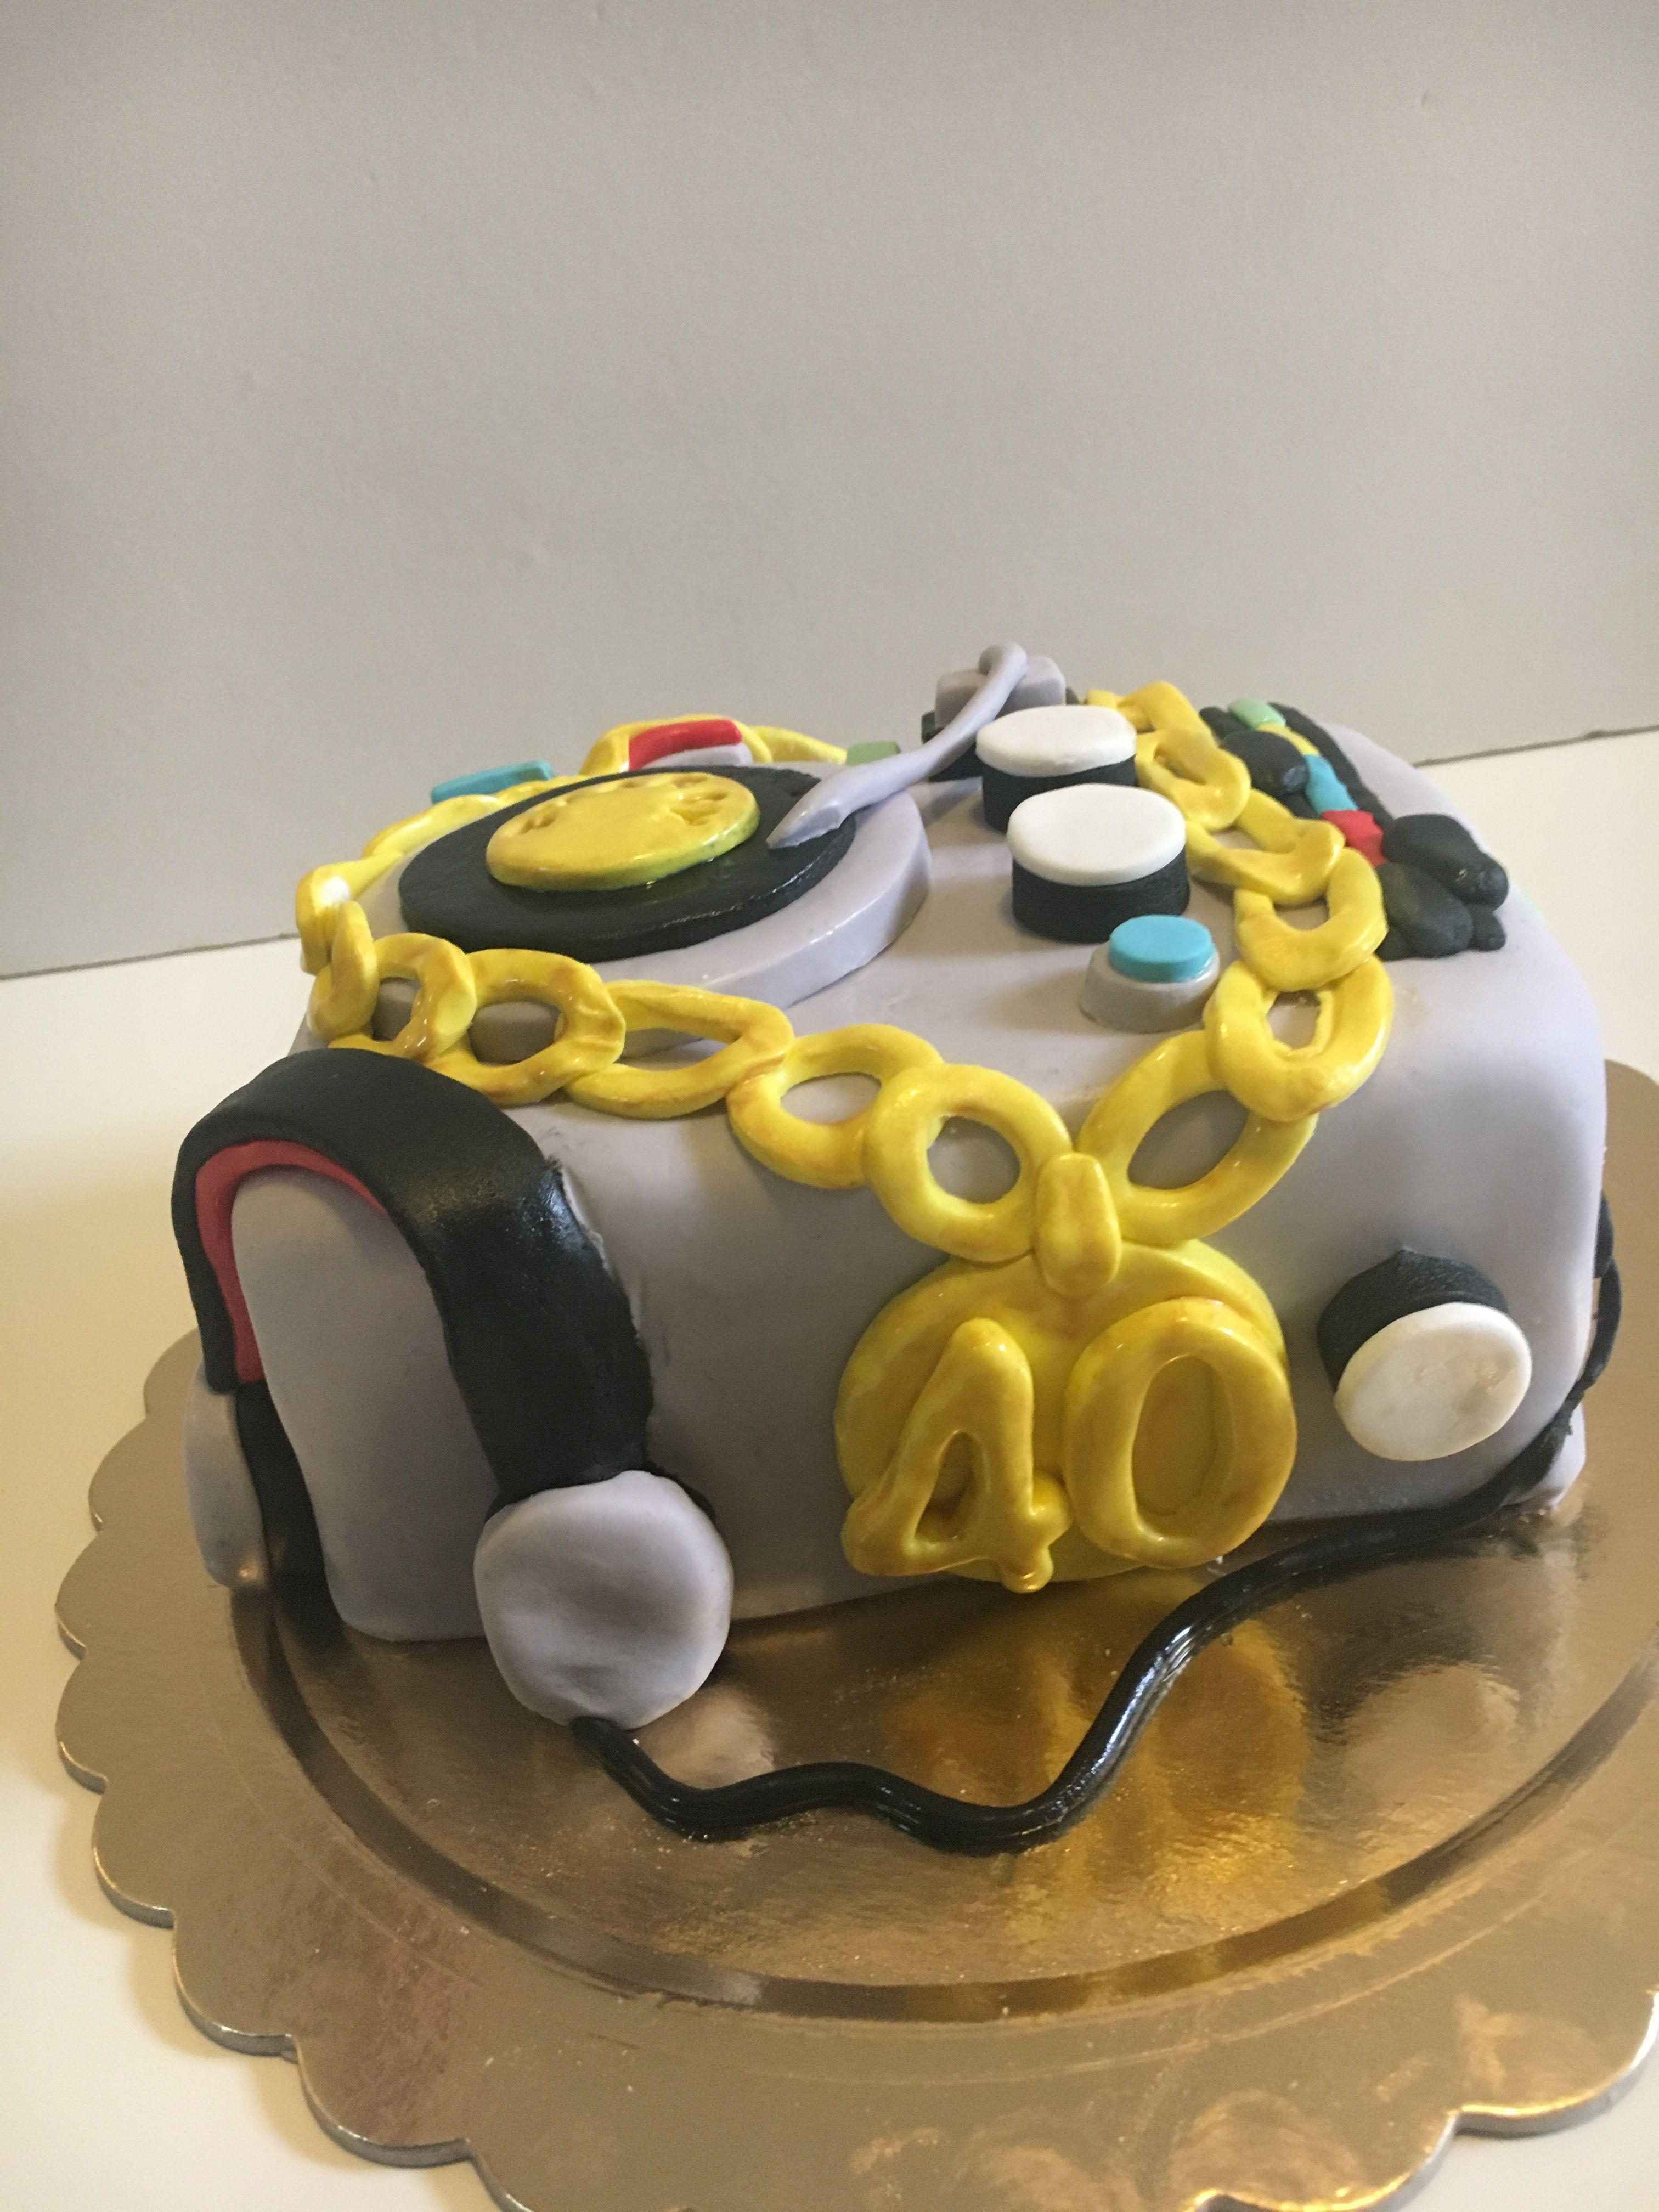 80's DJ Hip Hop cake (With images) Creative cakes, Cake